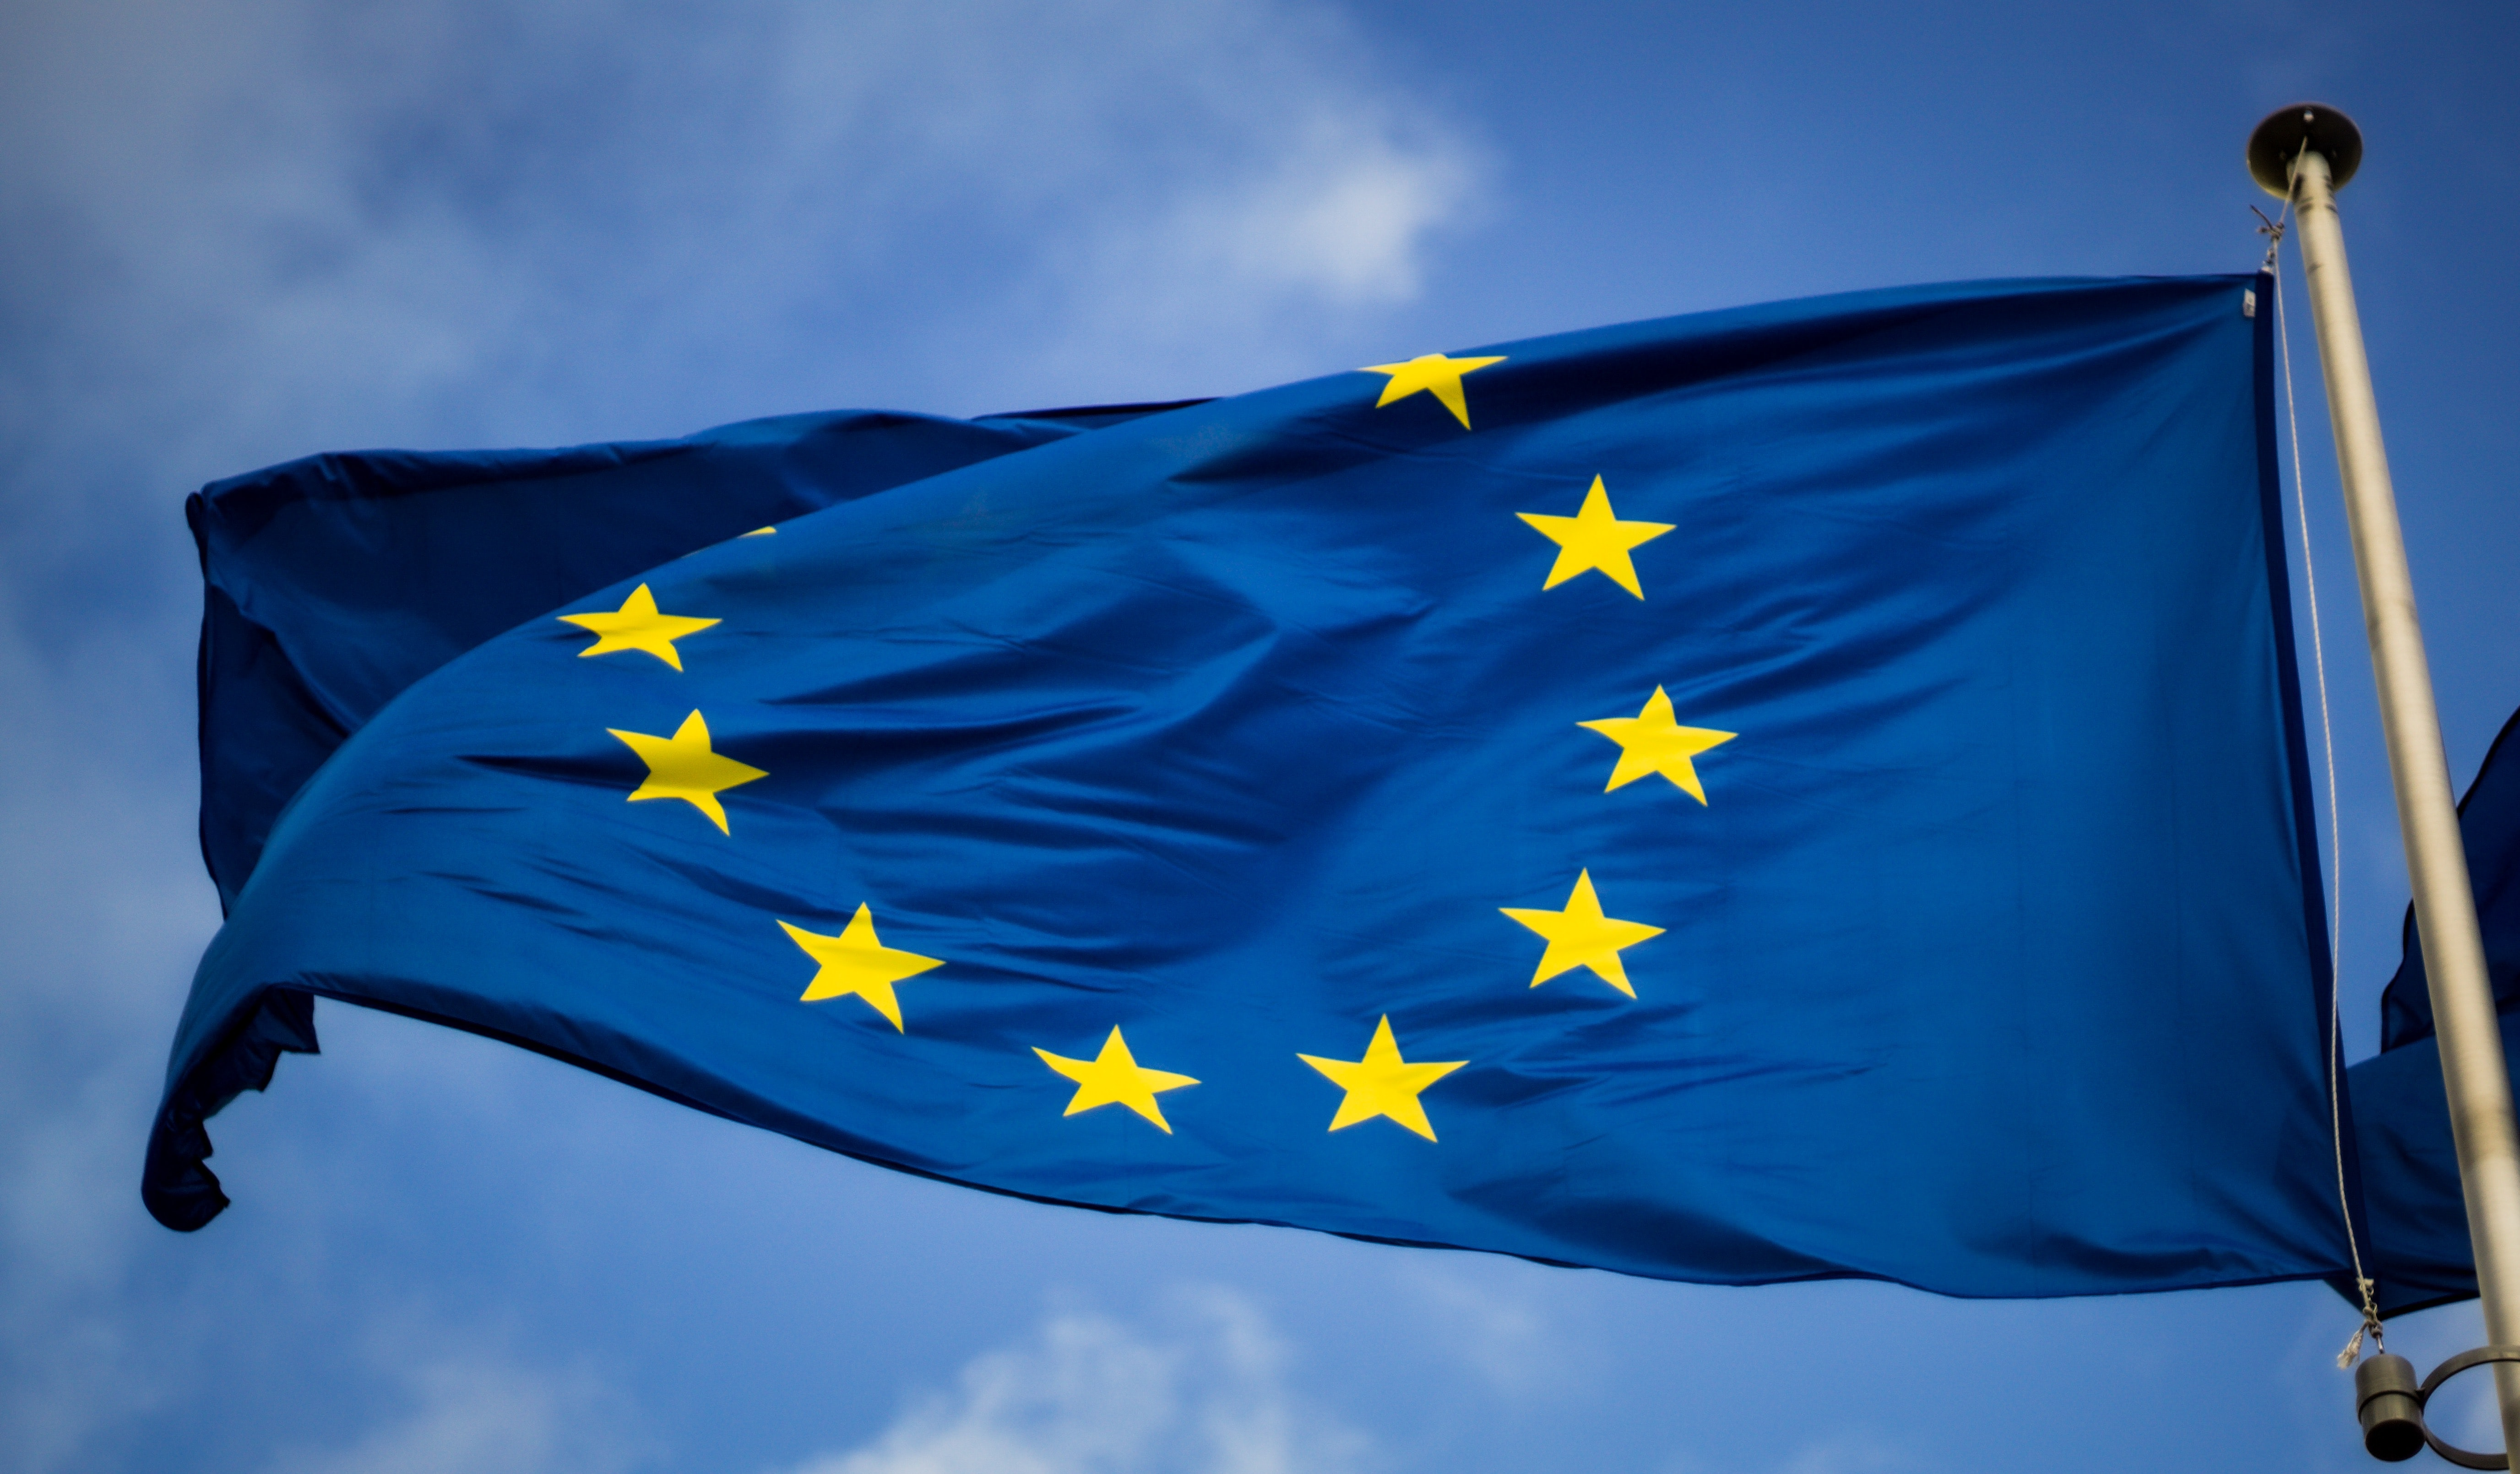 European Spending on Big Data Reaches $50 Billion